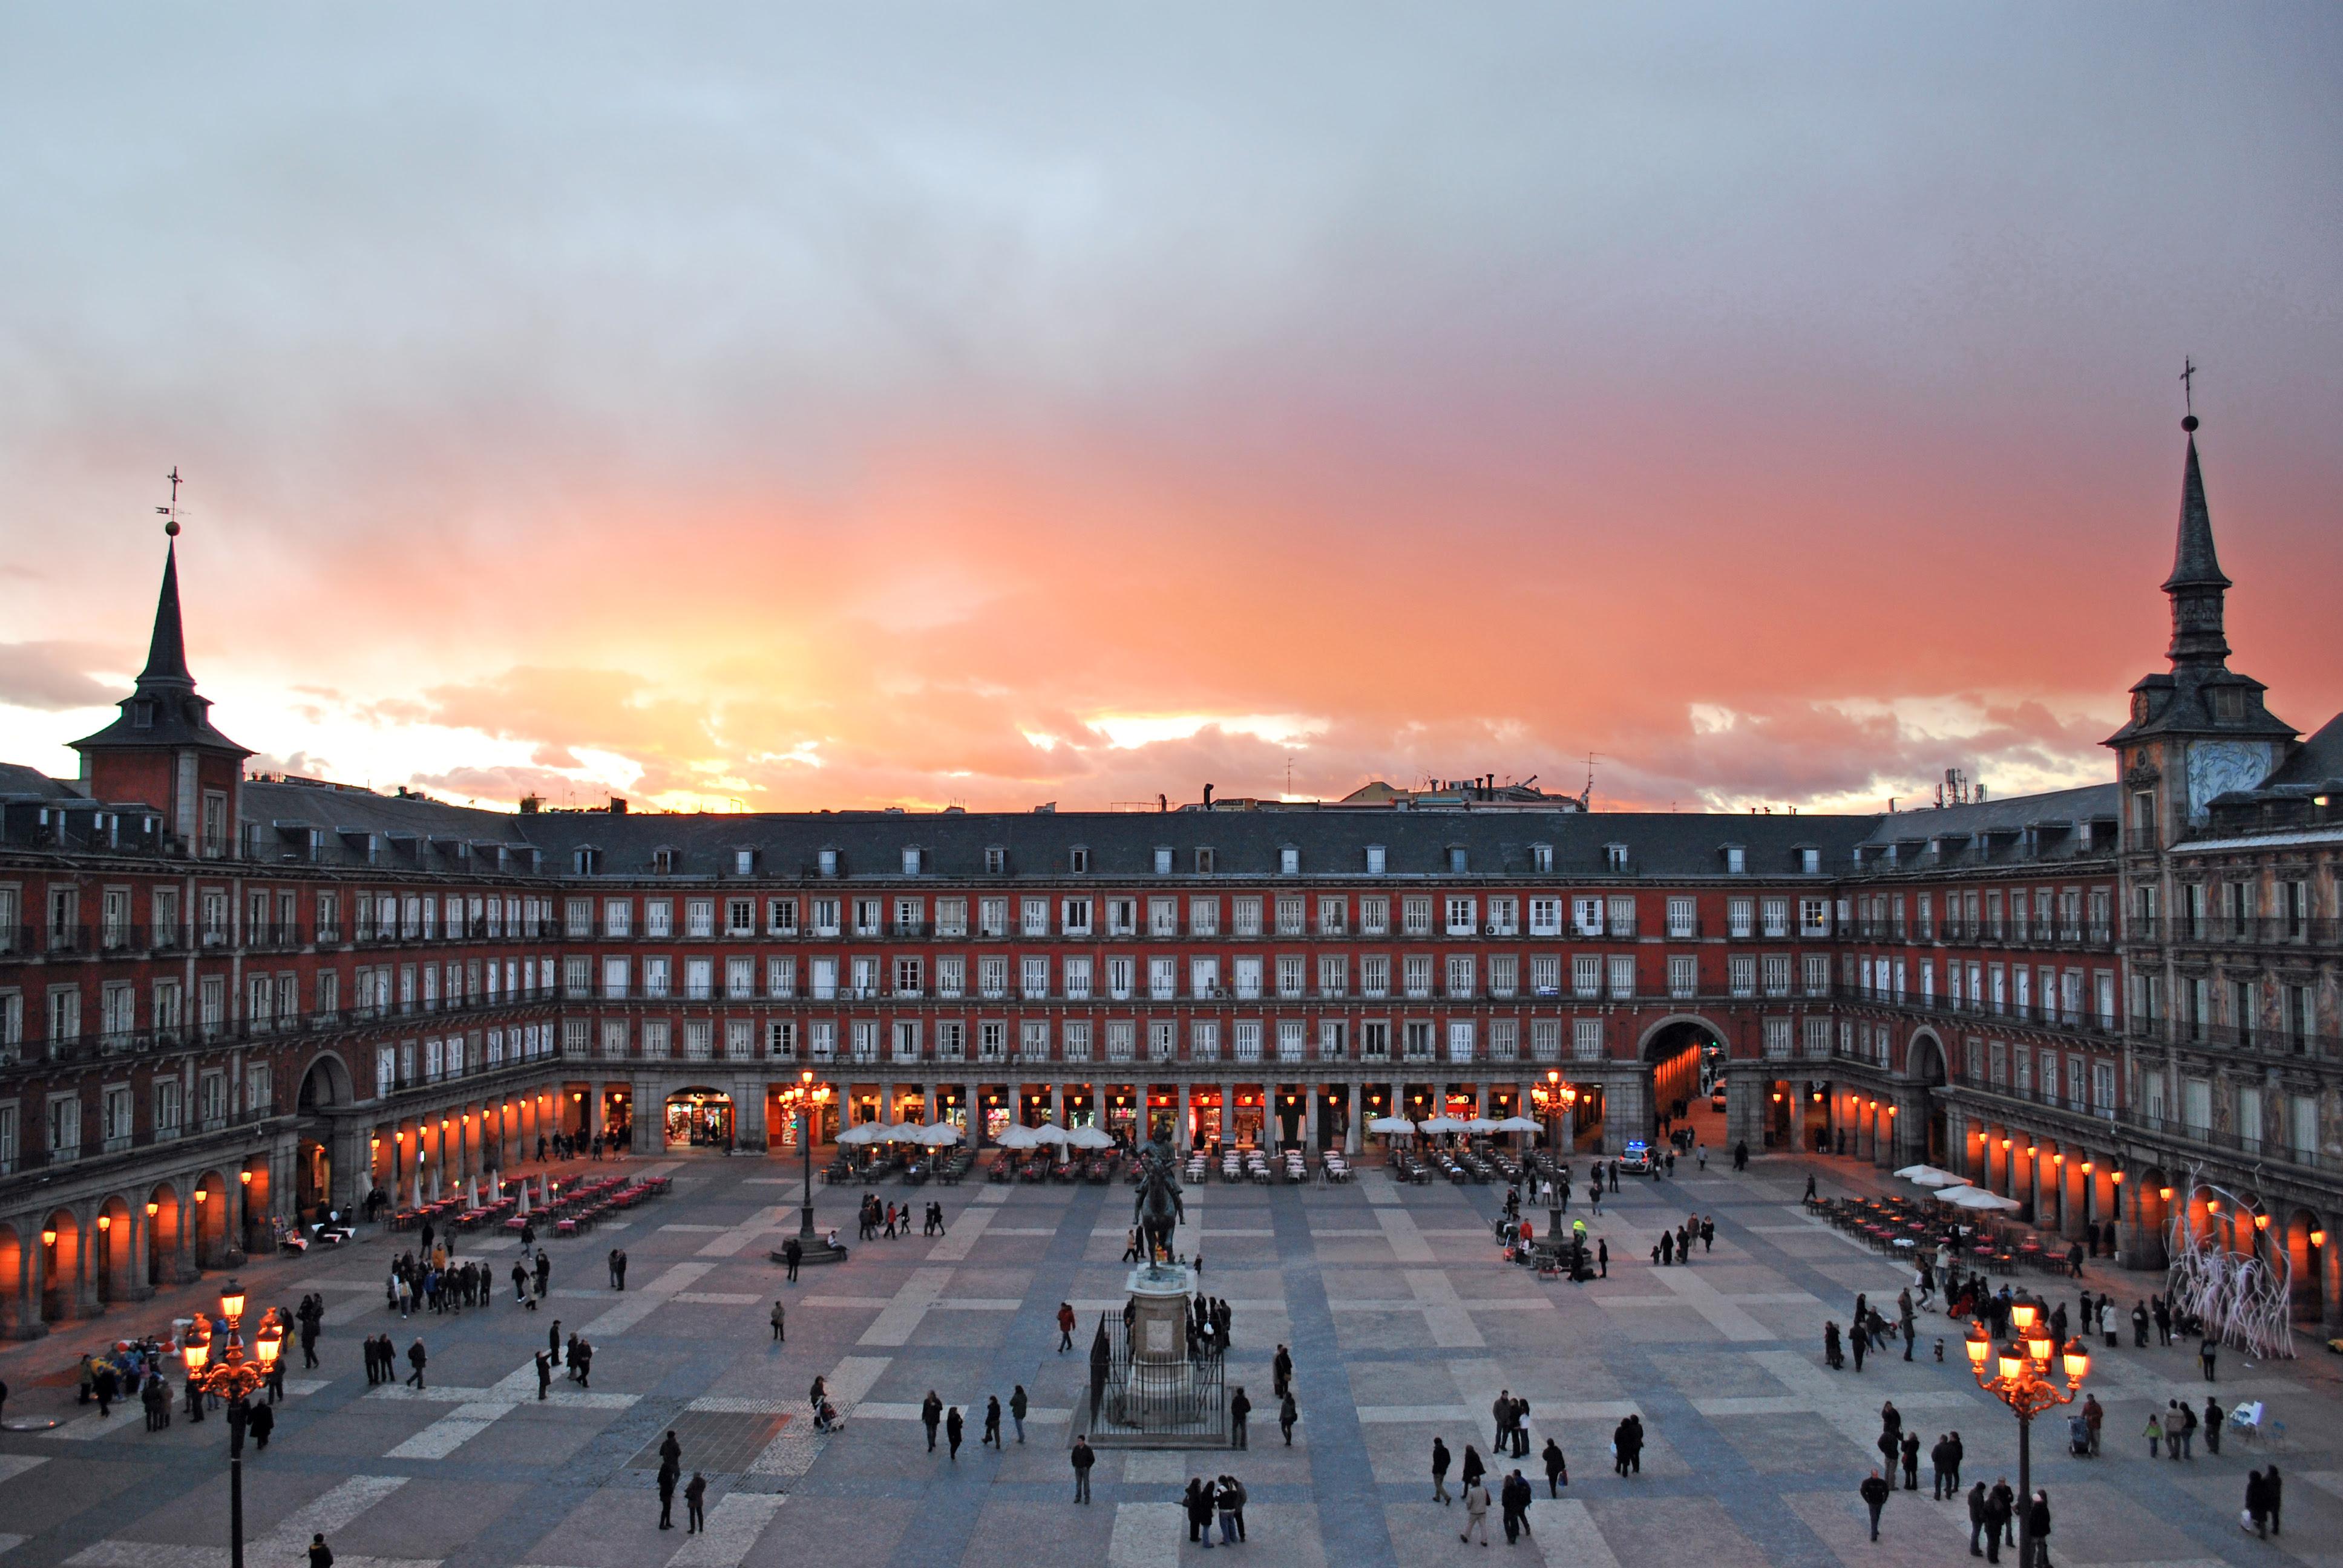 http://upload.wikimedia.org/wikipedia/commons/b/bb/Plaza_Mayor_de_Madrid_02.jpg